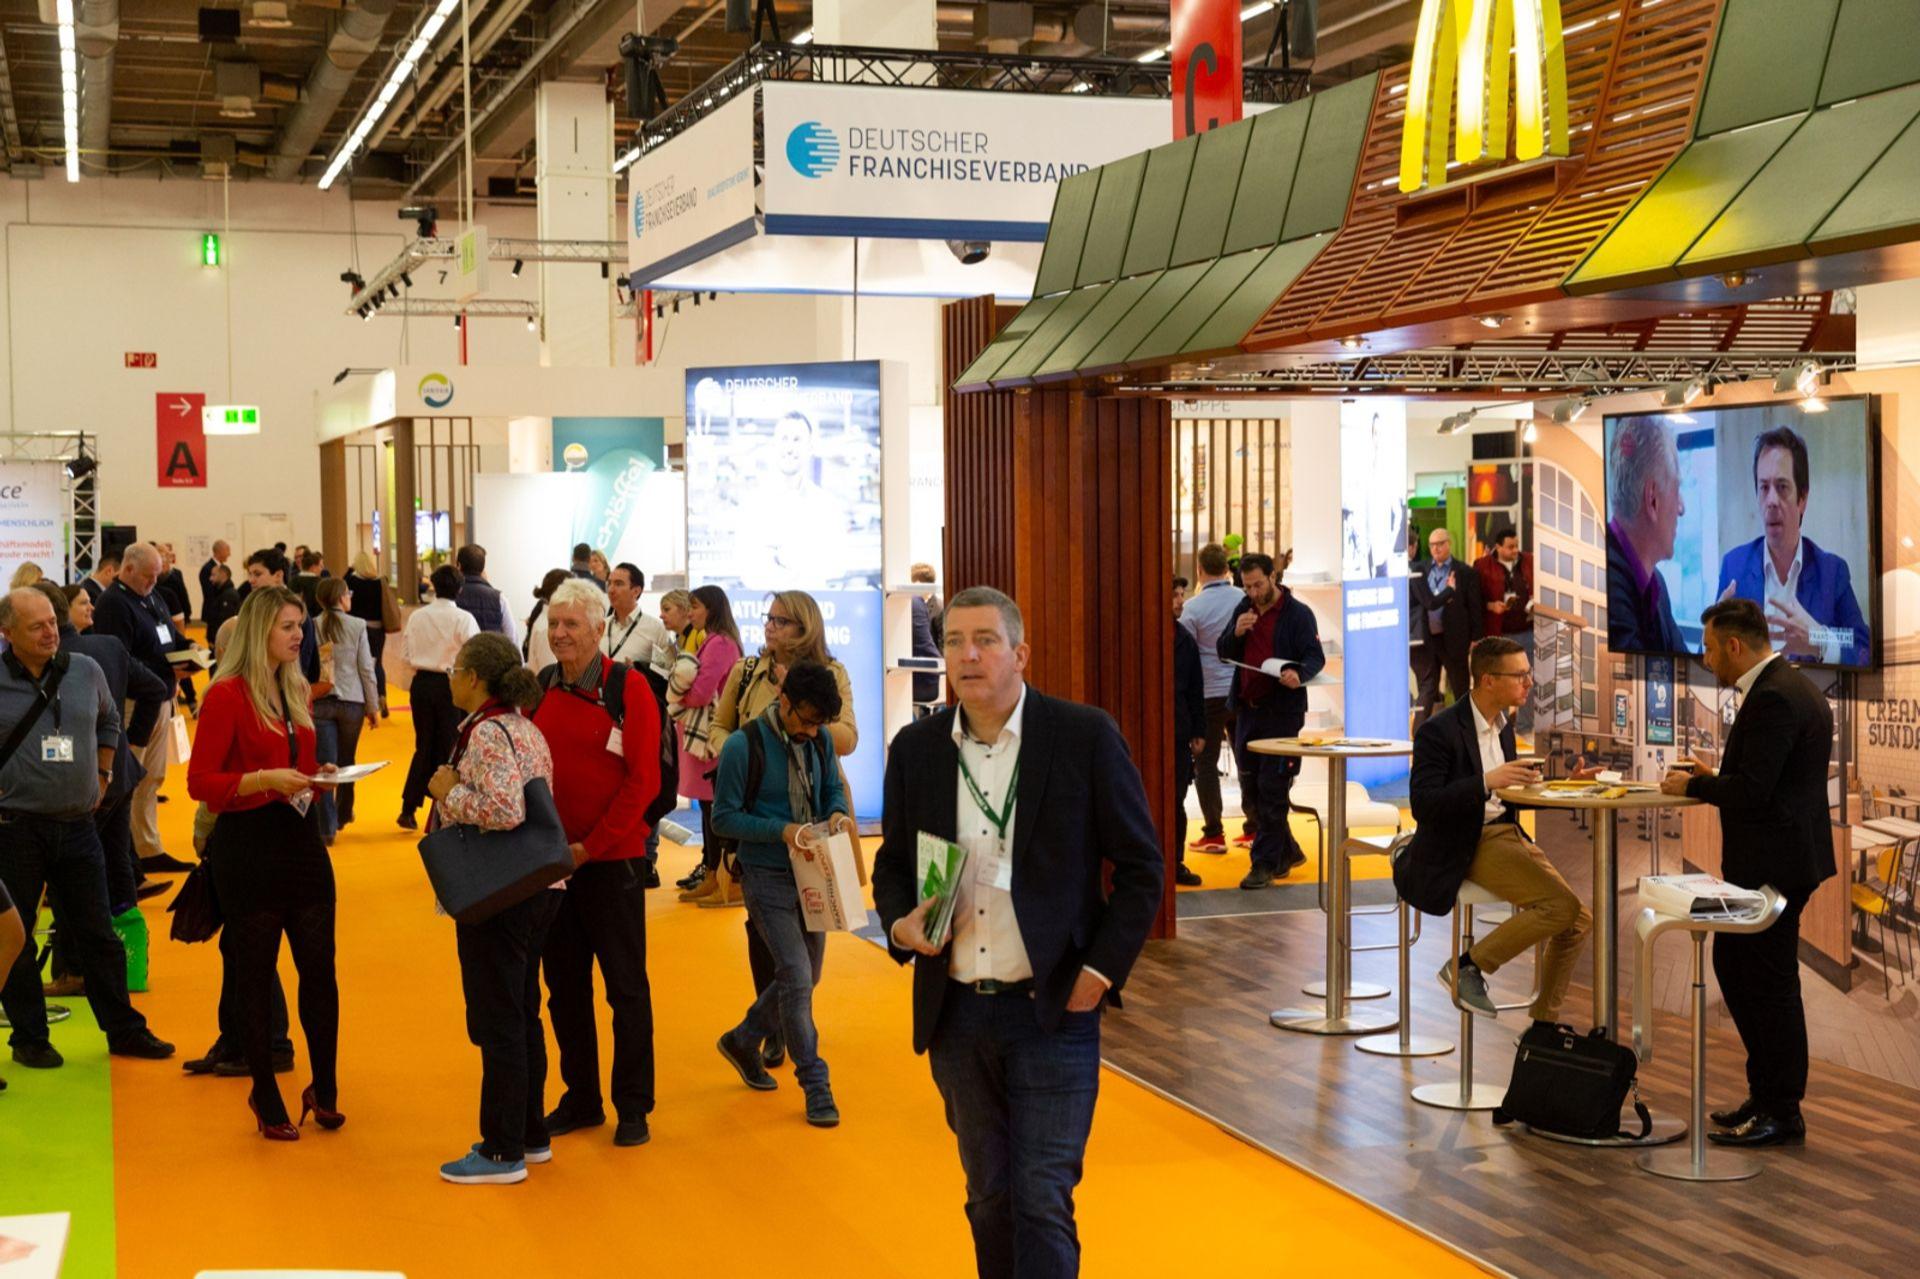 Anfang November: Franchise Expo 2021 in Frankfurt wird als 2G-Messe veranstaltet